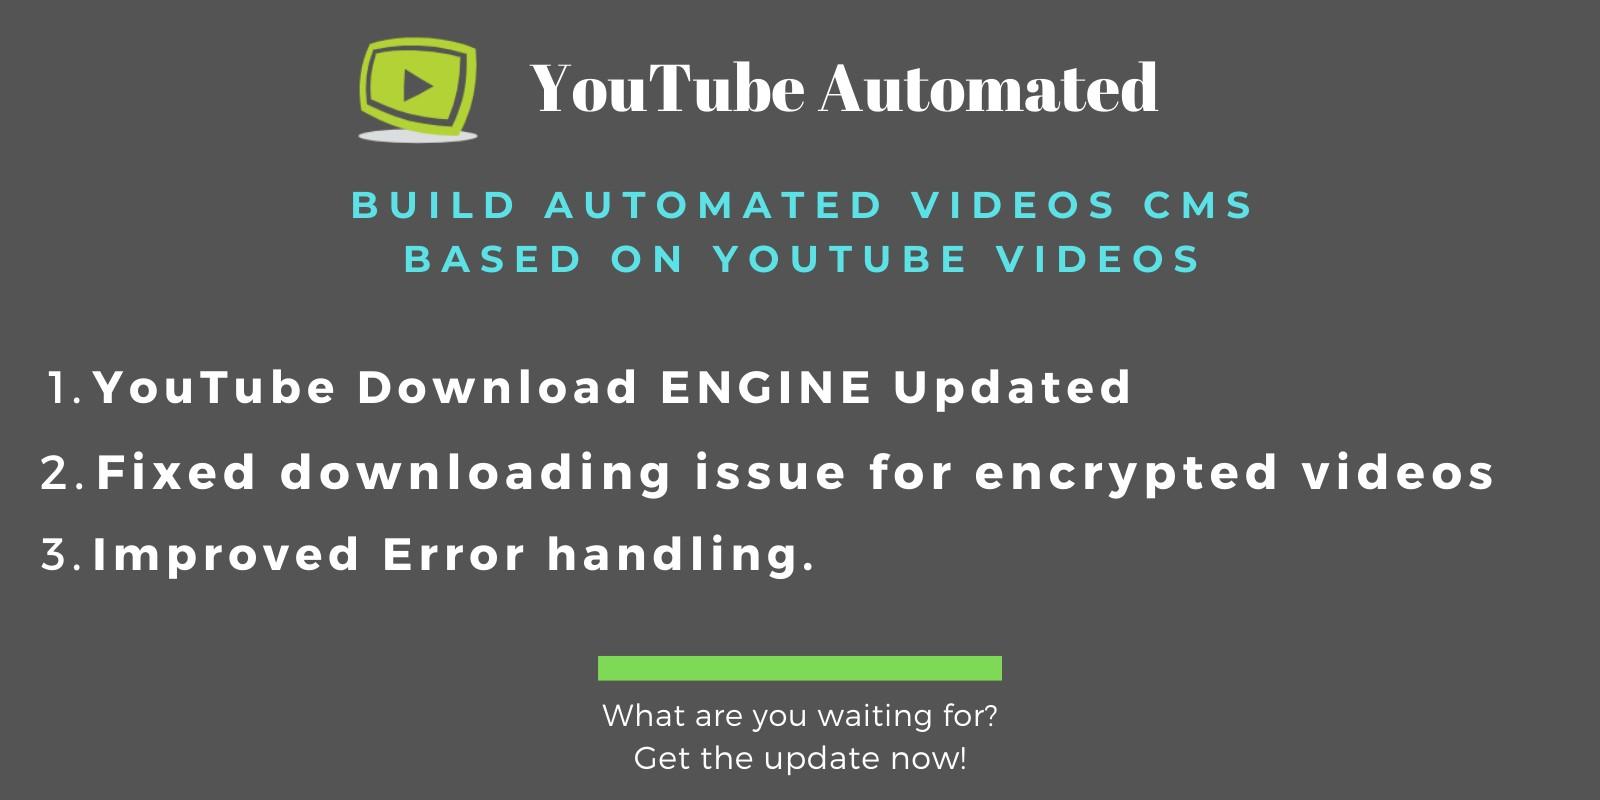 Autopilot Youtube Videos CMS - Youtube Automated